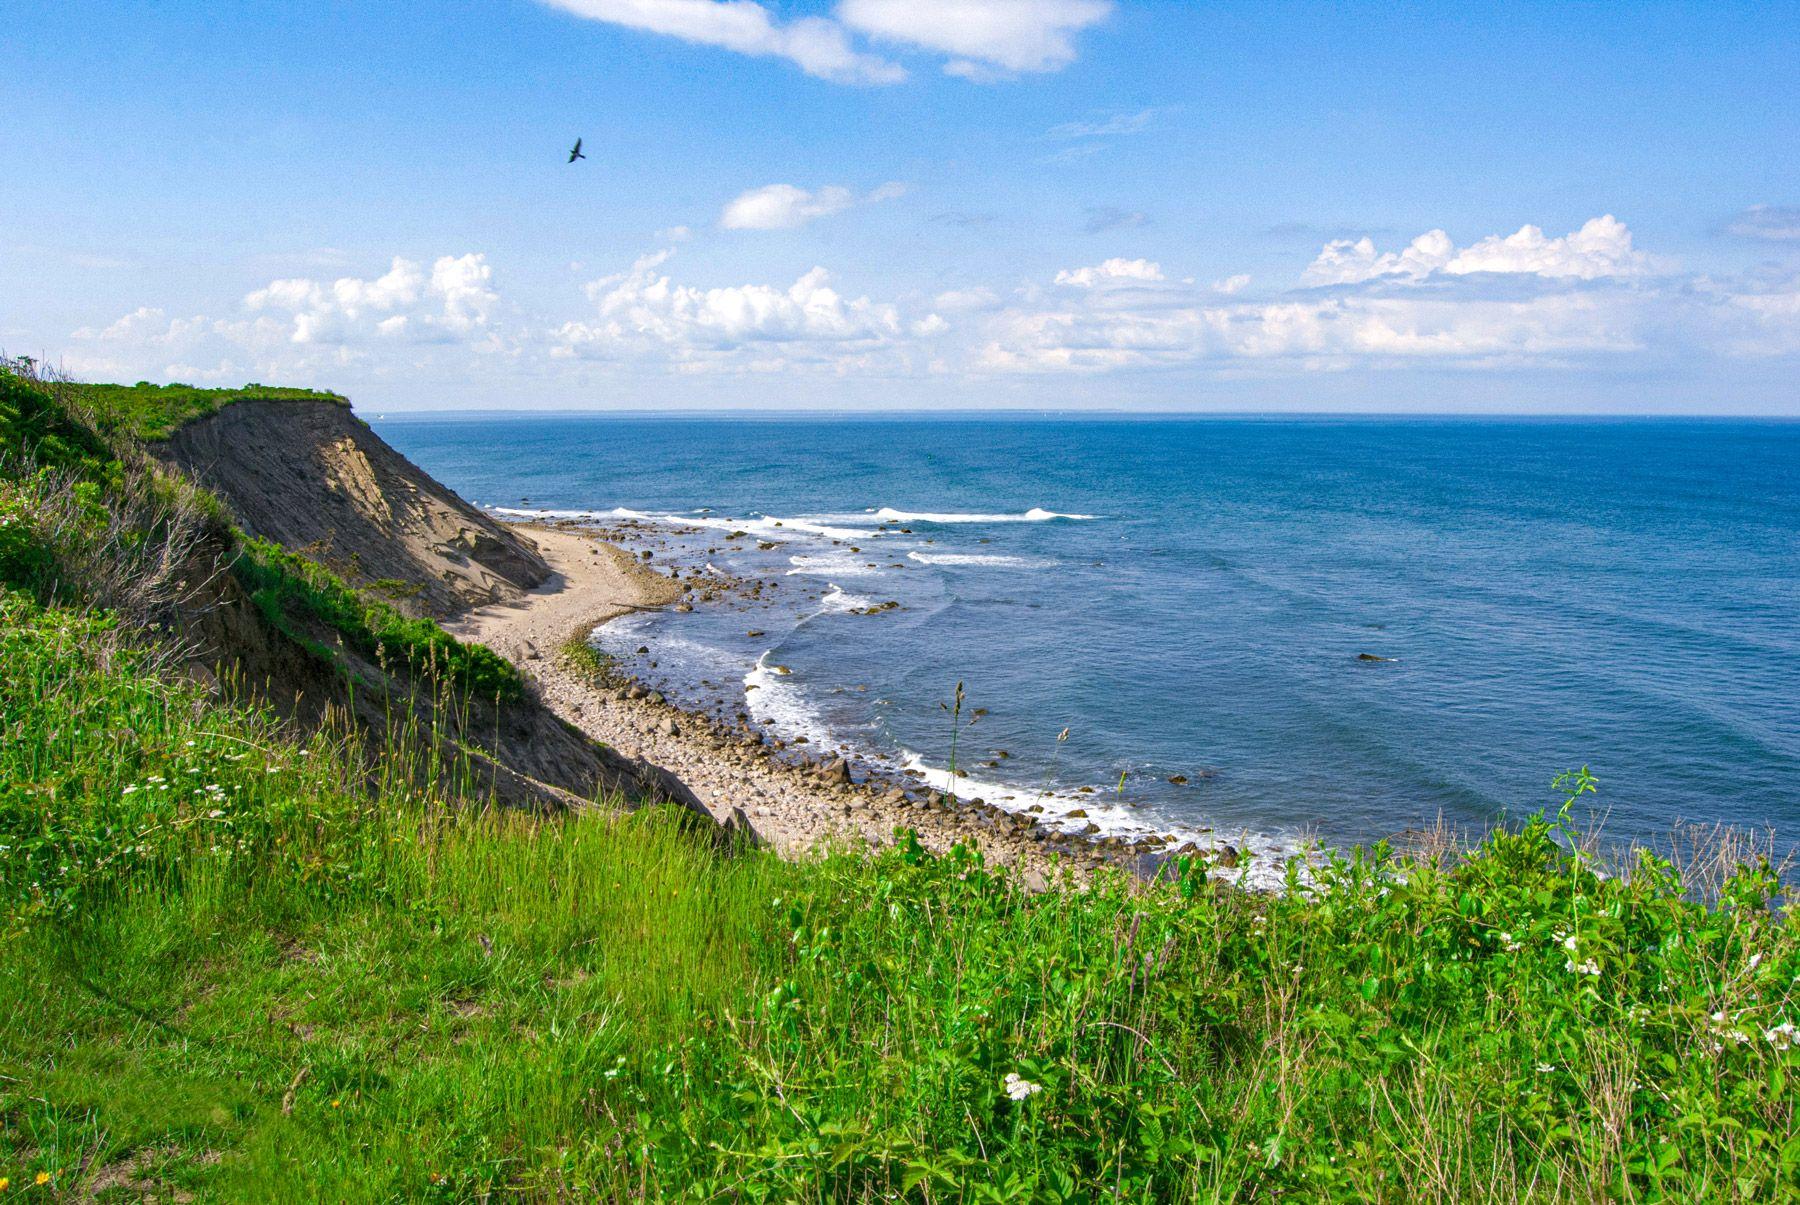 Mohegan Bluffs Block Island Rhode Island USA